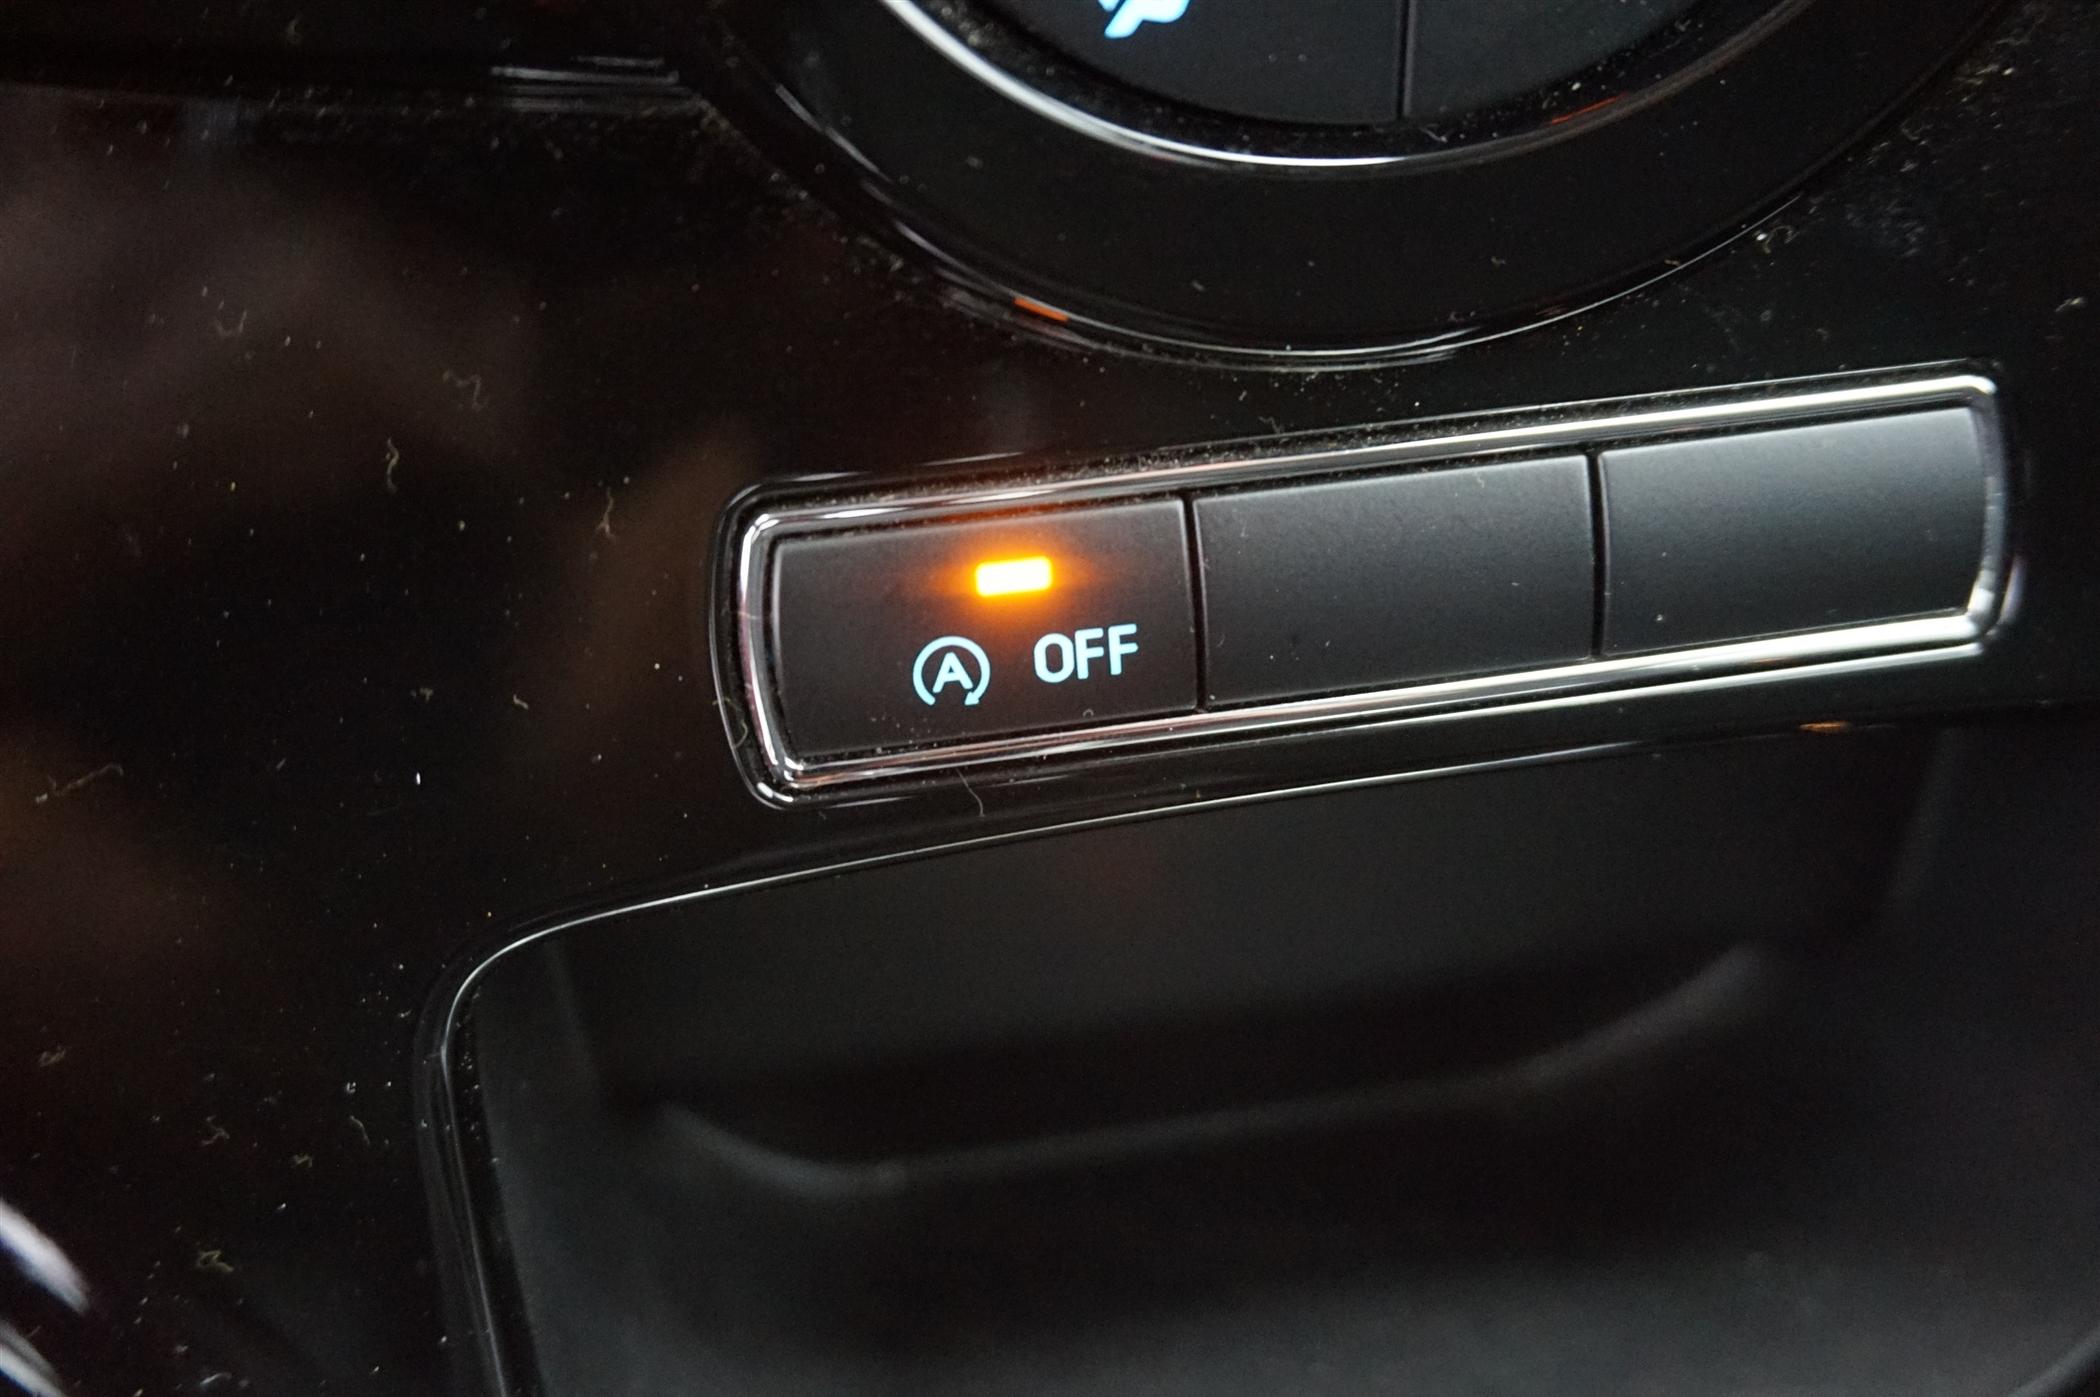 Ford Fiesta 1.0 Ti-VCT Titanium